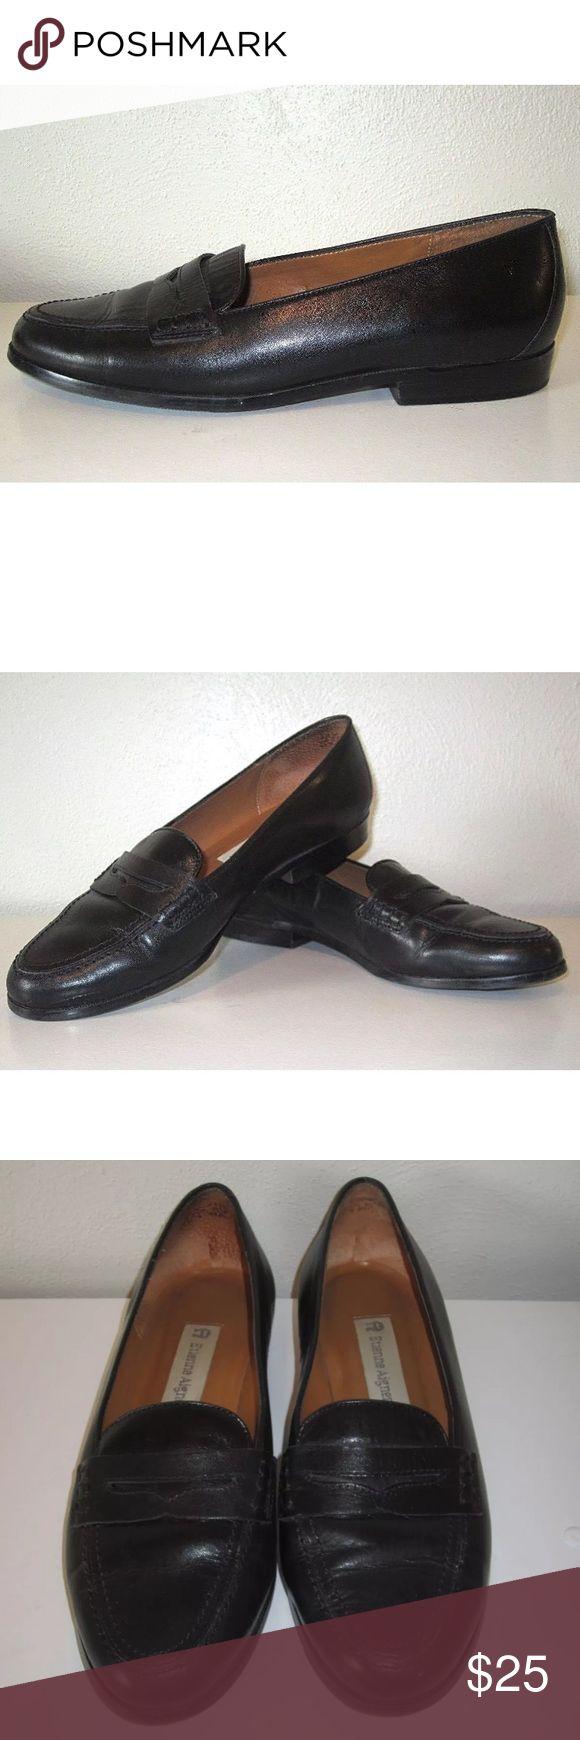 Etienne aigner black leather gloves - Etienne Aigner Black Leather Loafer Shoes 7m